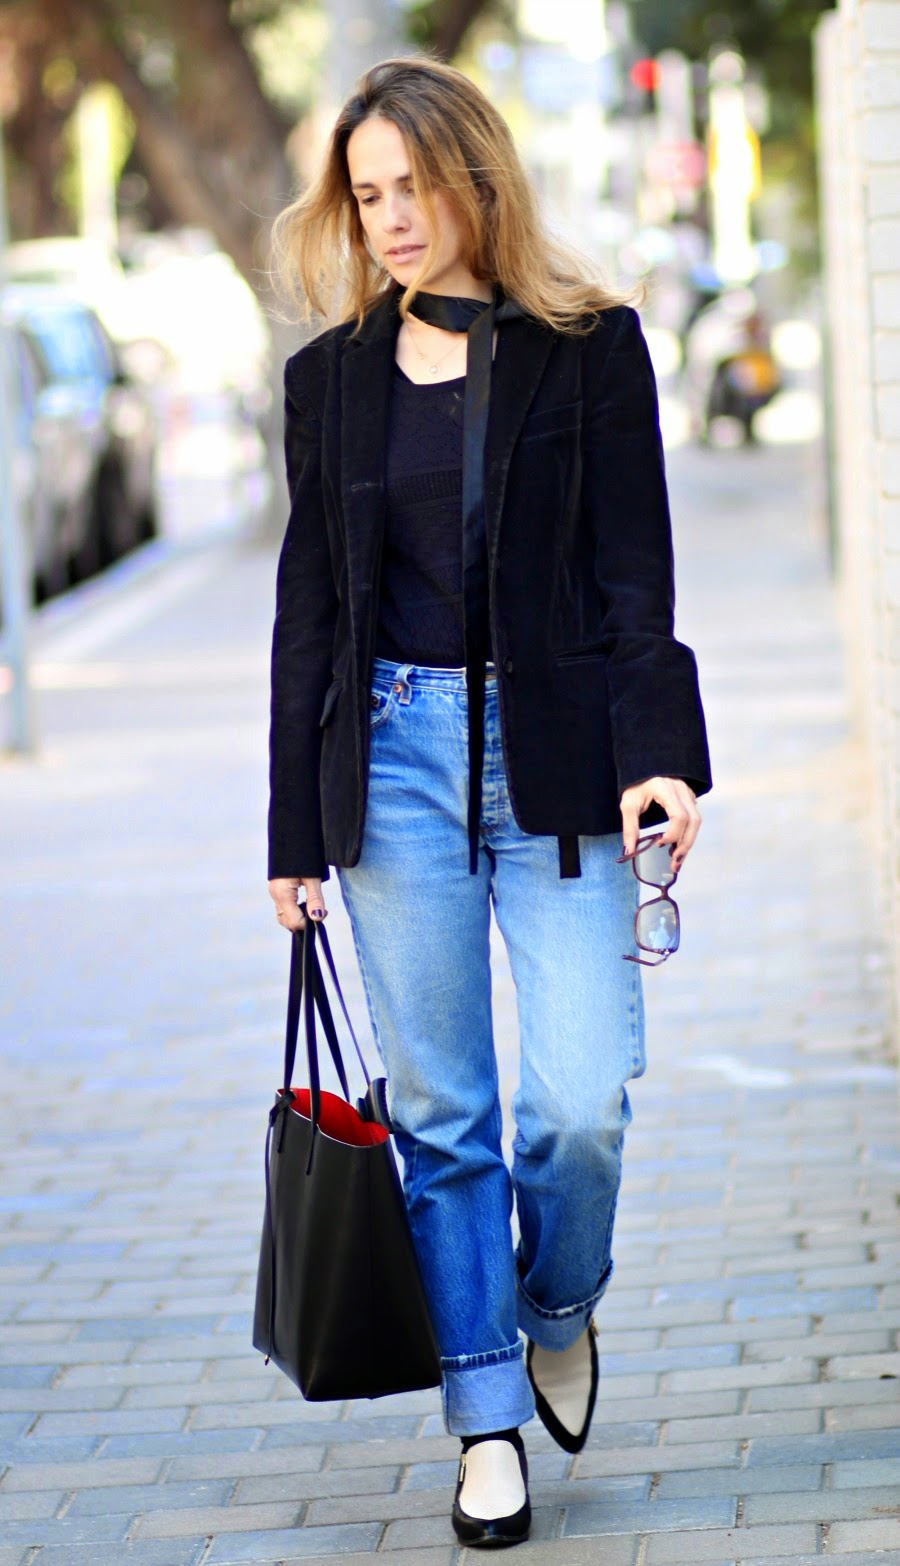 silkscarf, ootd, blazer, lookoftheday, ss15, streetstyle, alexachung, fashionblog, בלוגאופנה, אופנה, אלקסהצ'אנג